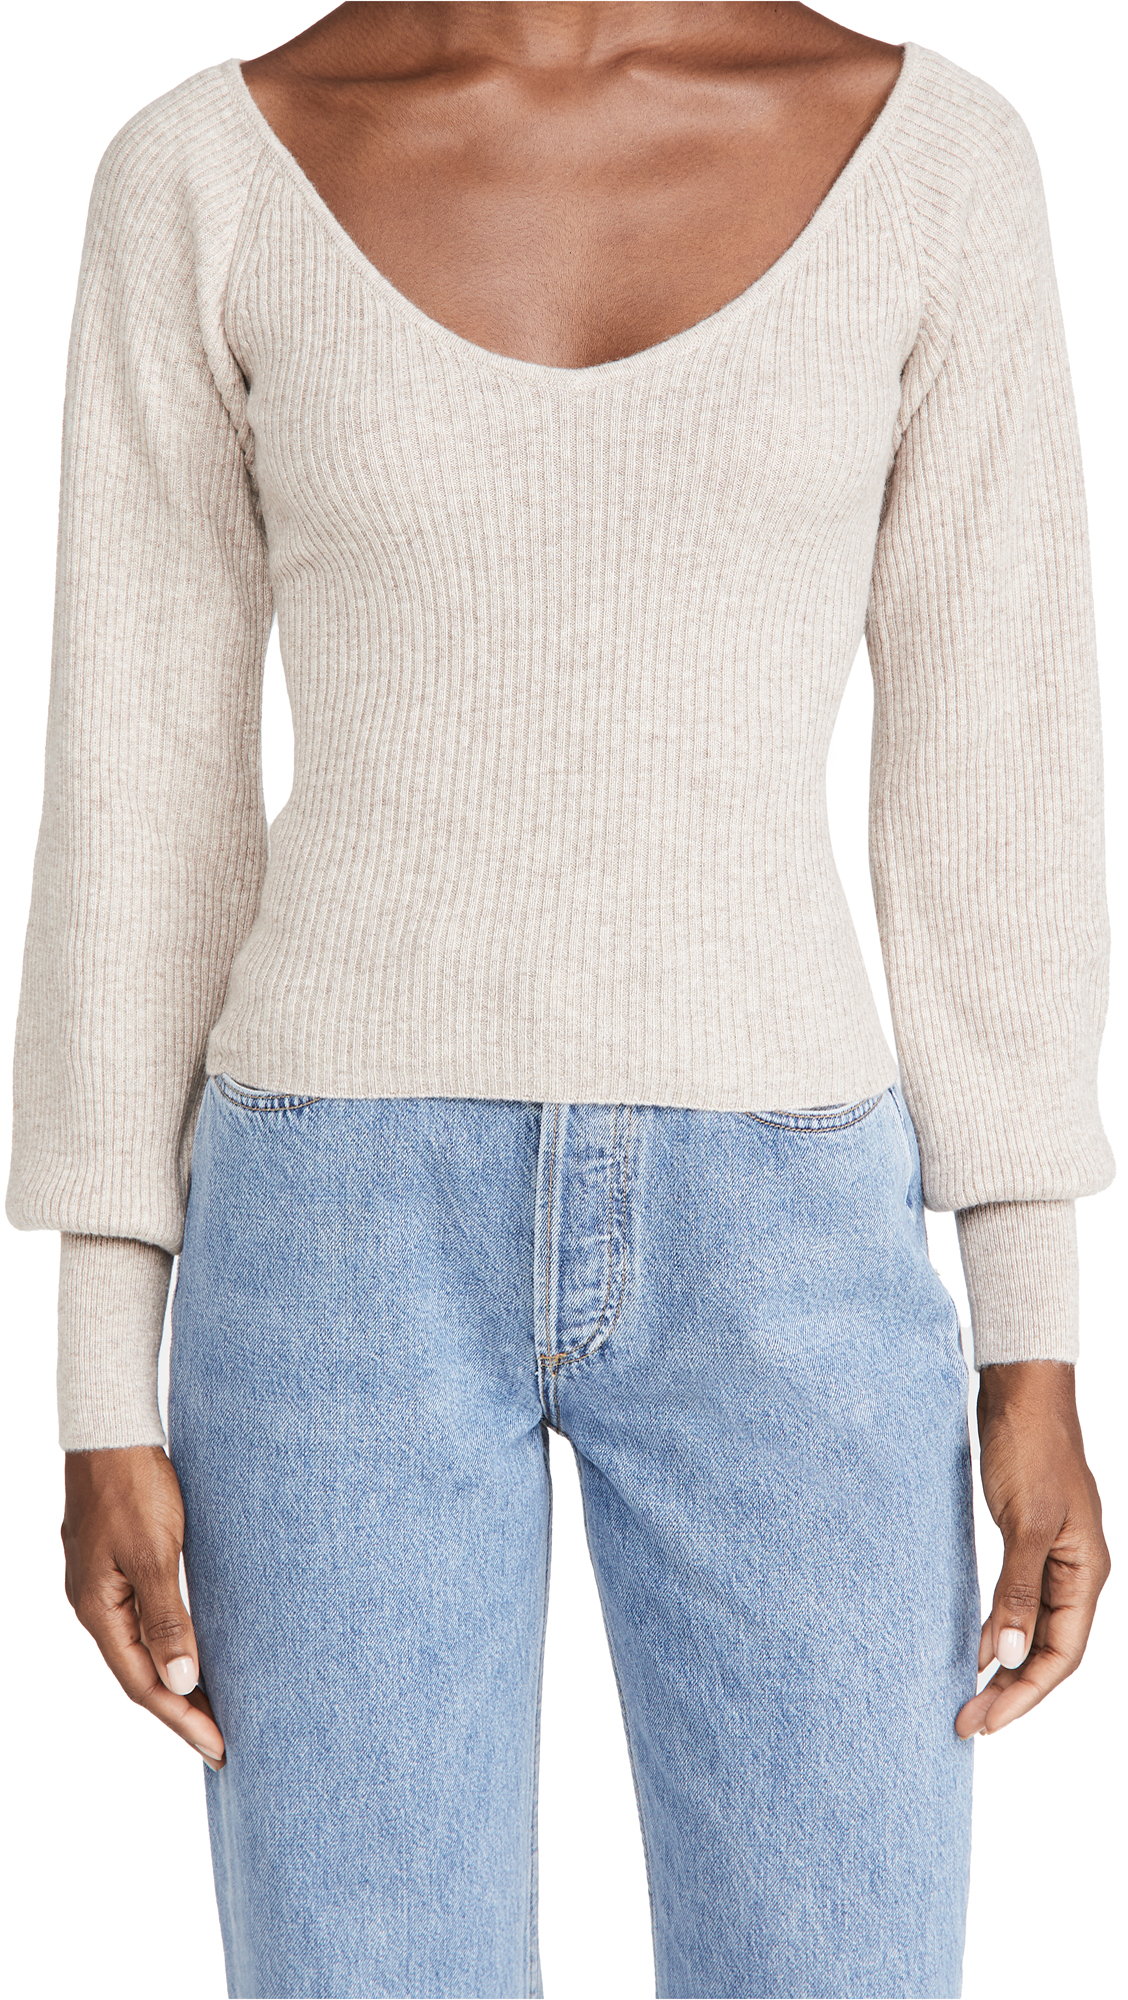 Reformation Hart Cashmere Sweater